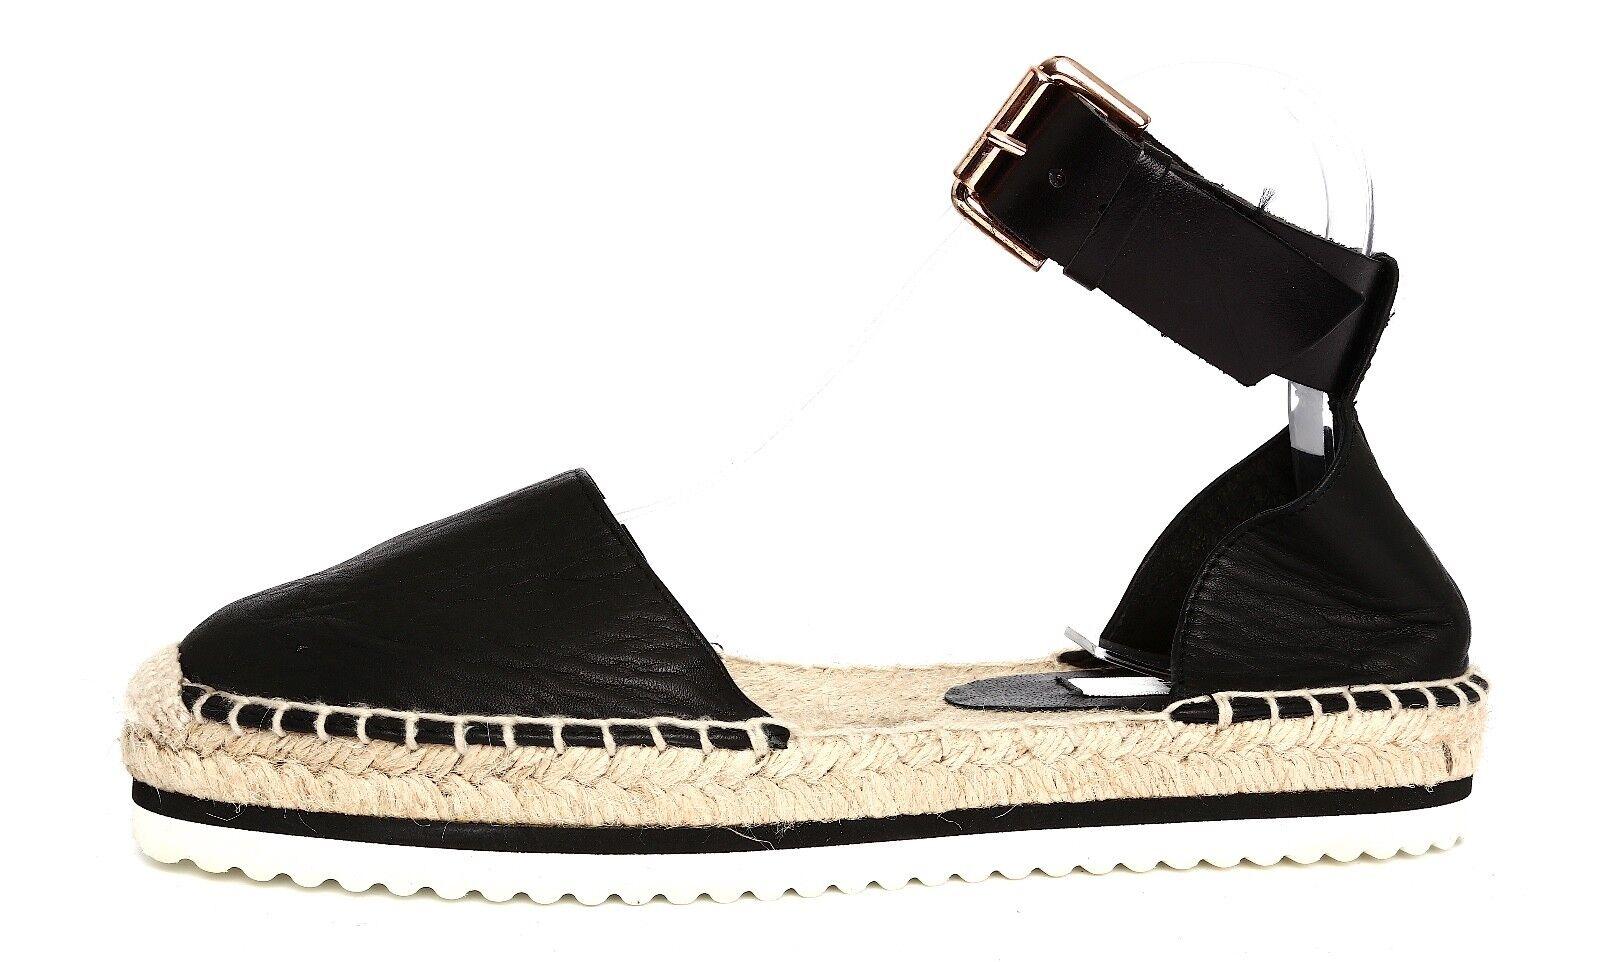 prezzo all'ingrosso Miista Donna  nero Leather Ankle Ankle Ankle Strap Espadrilles Sz 36 EUR 3261  consegna gratuita